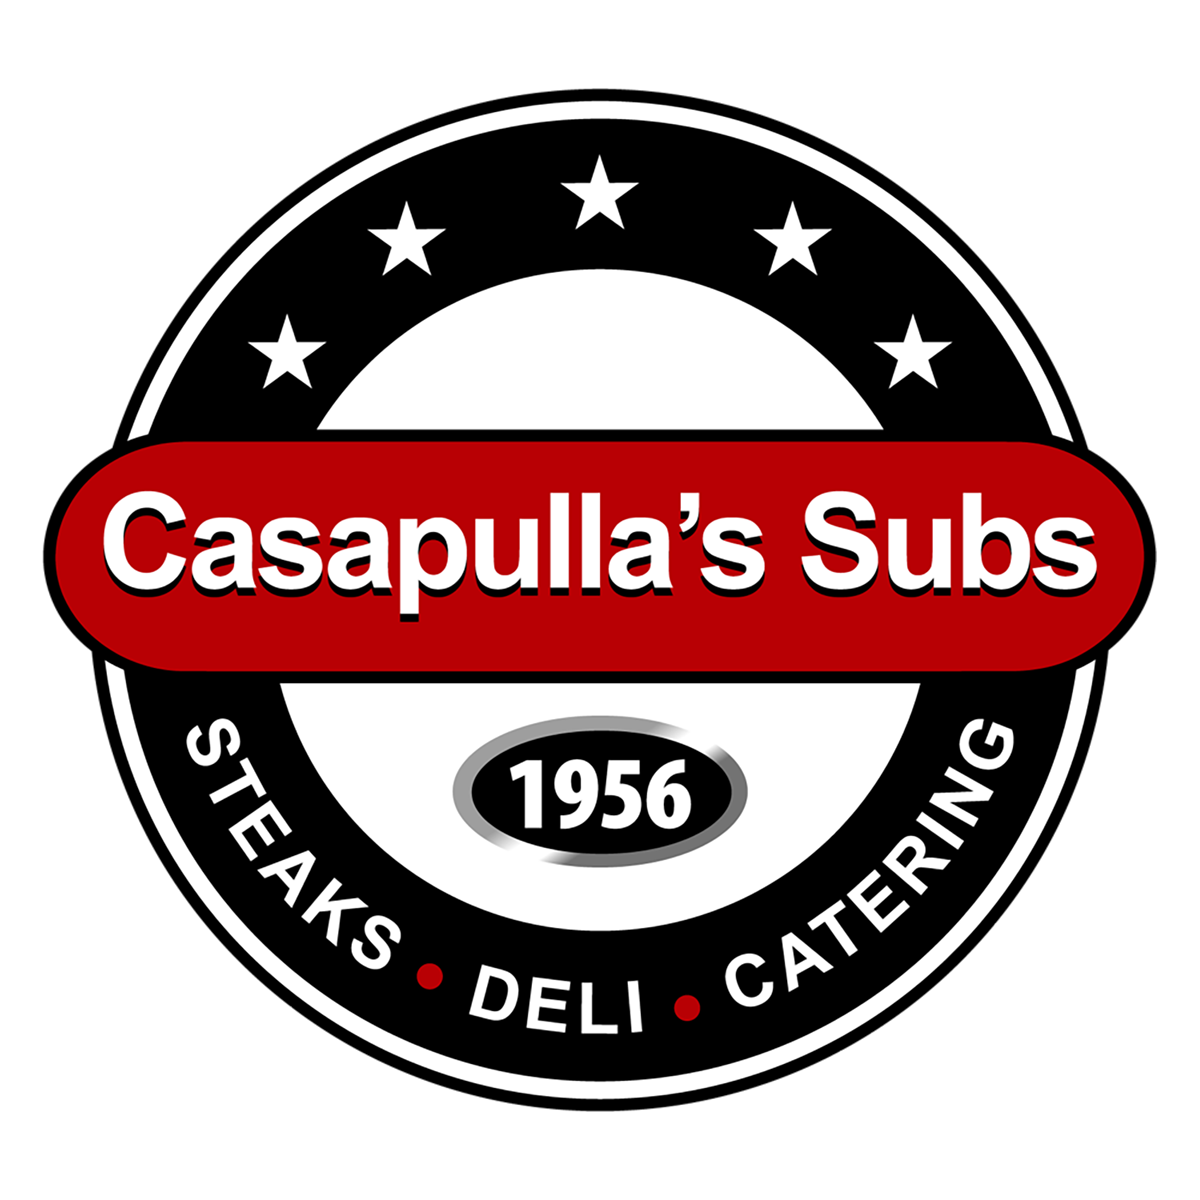 Casapulla's Subs